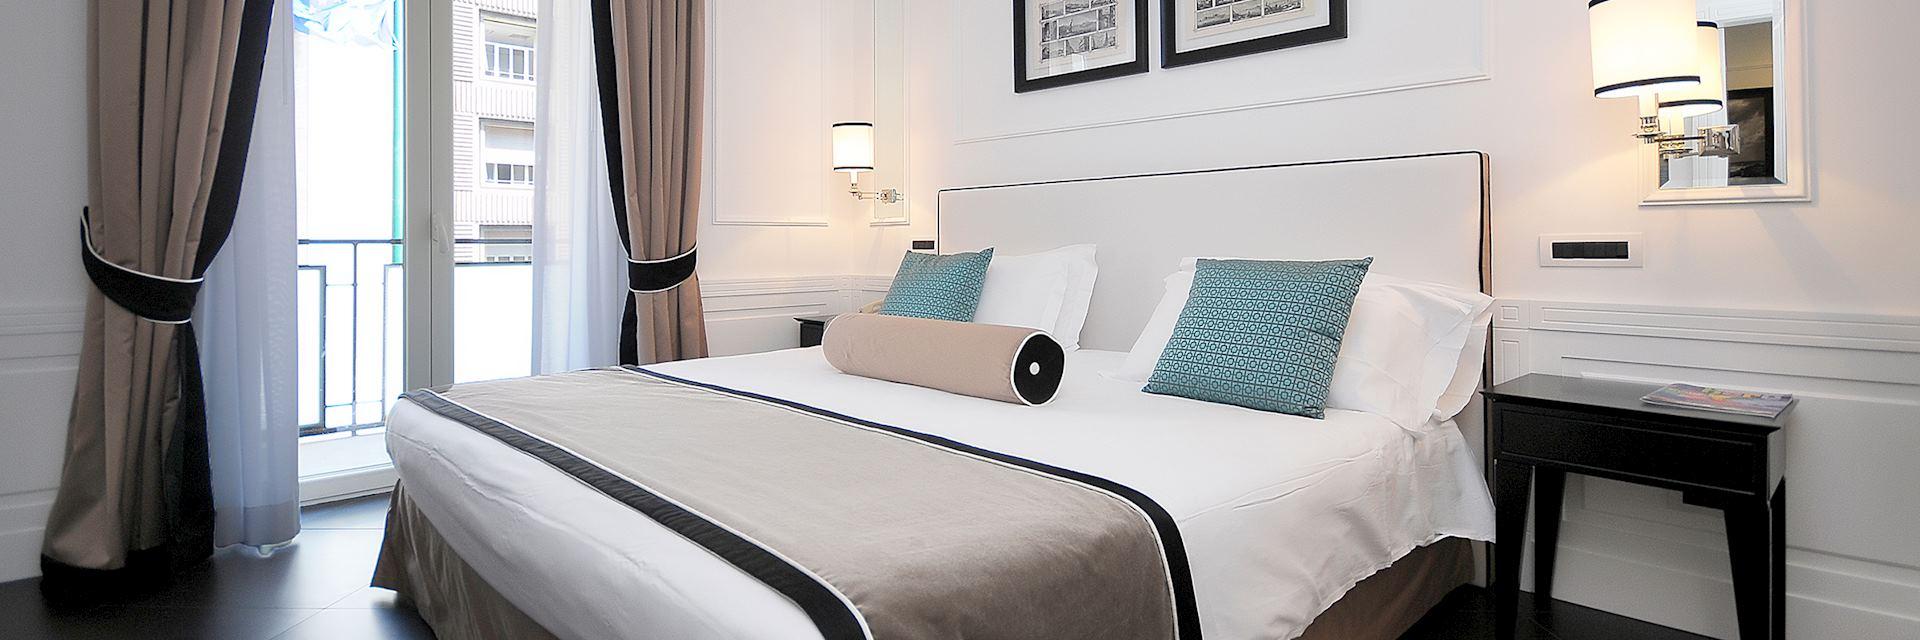 Executive Suite, Grand Hotel Oriente, Naples